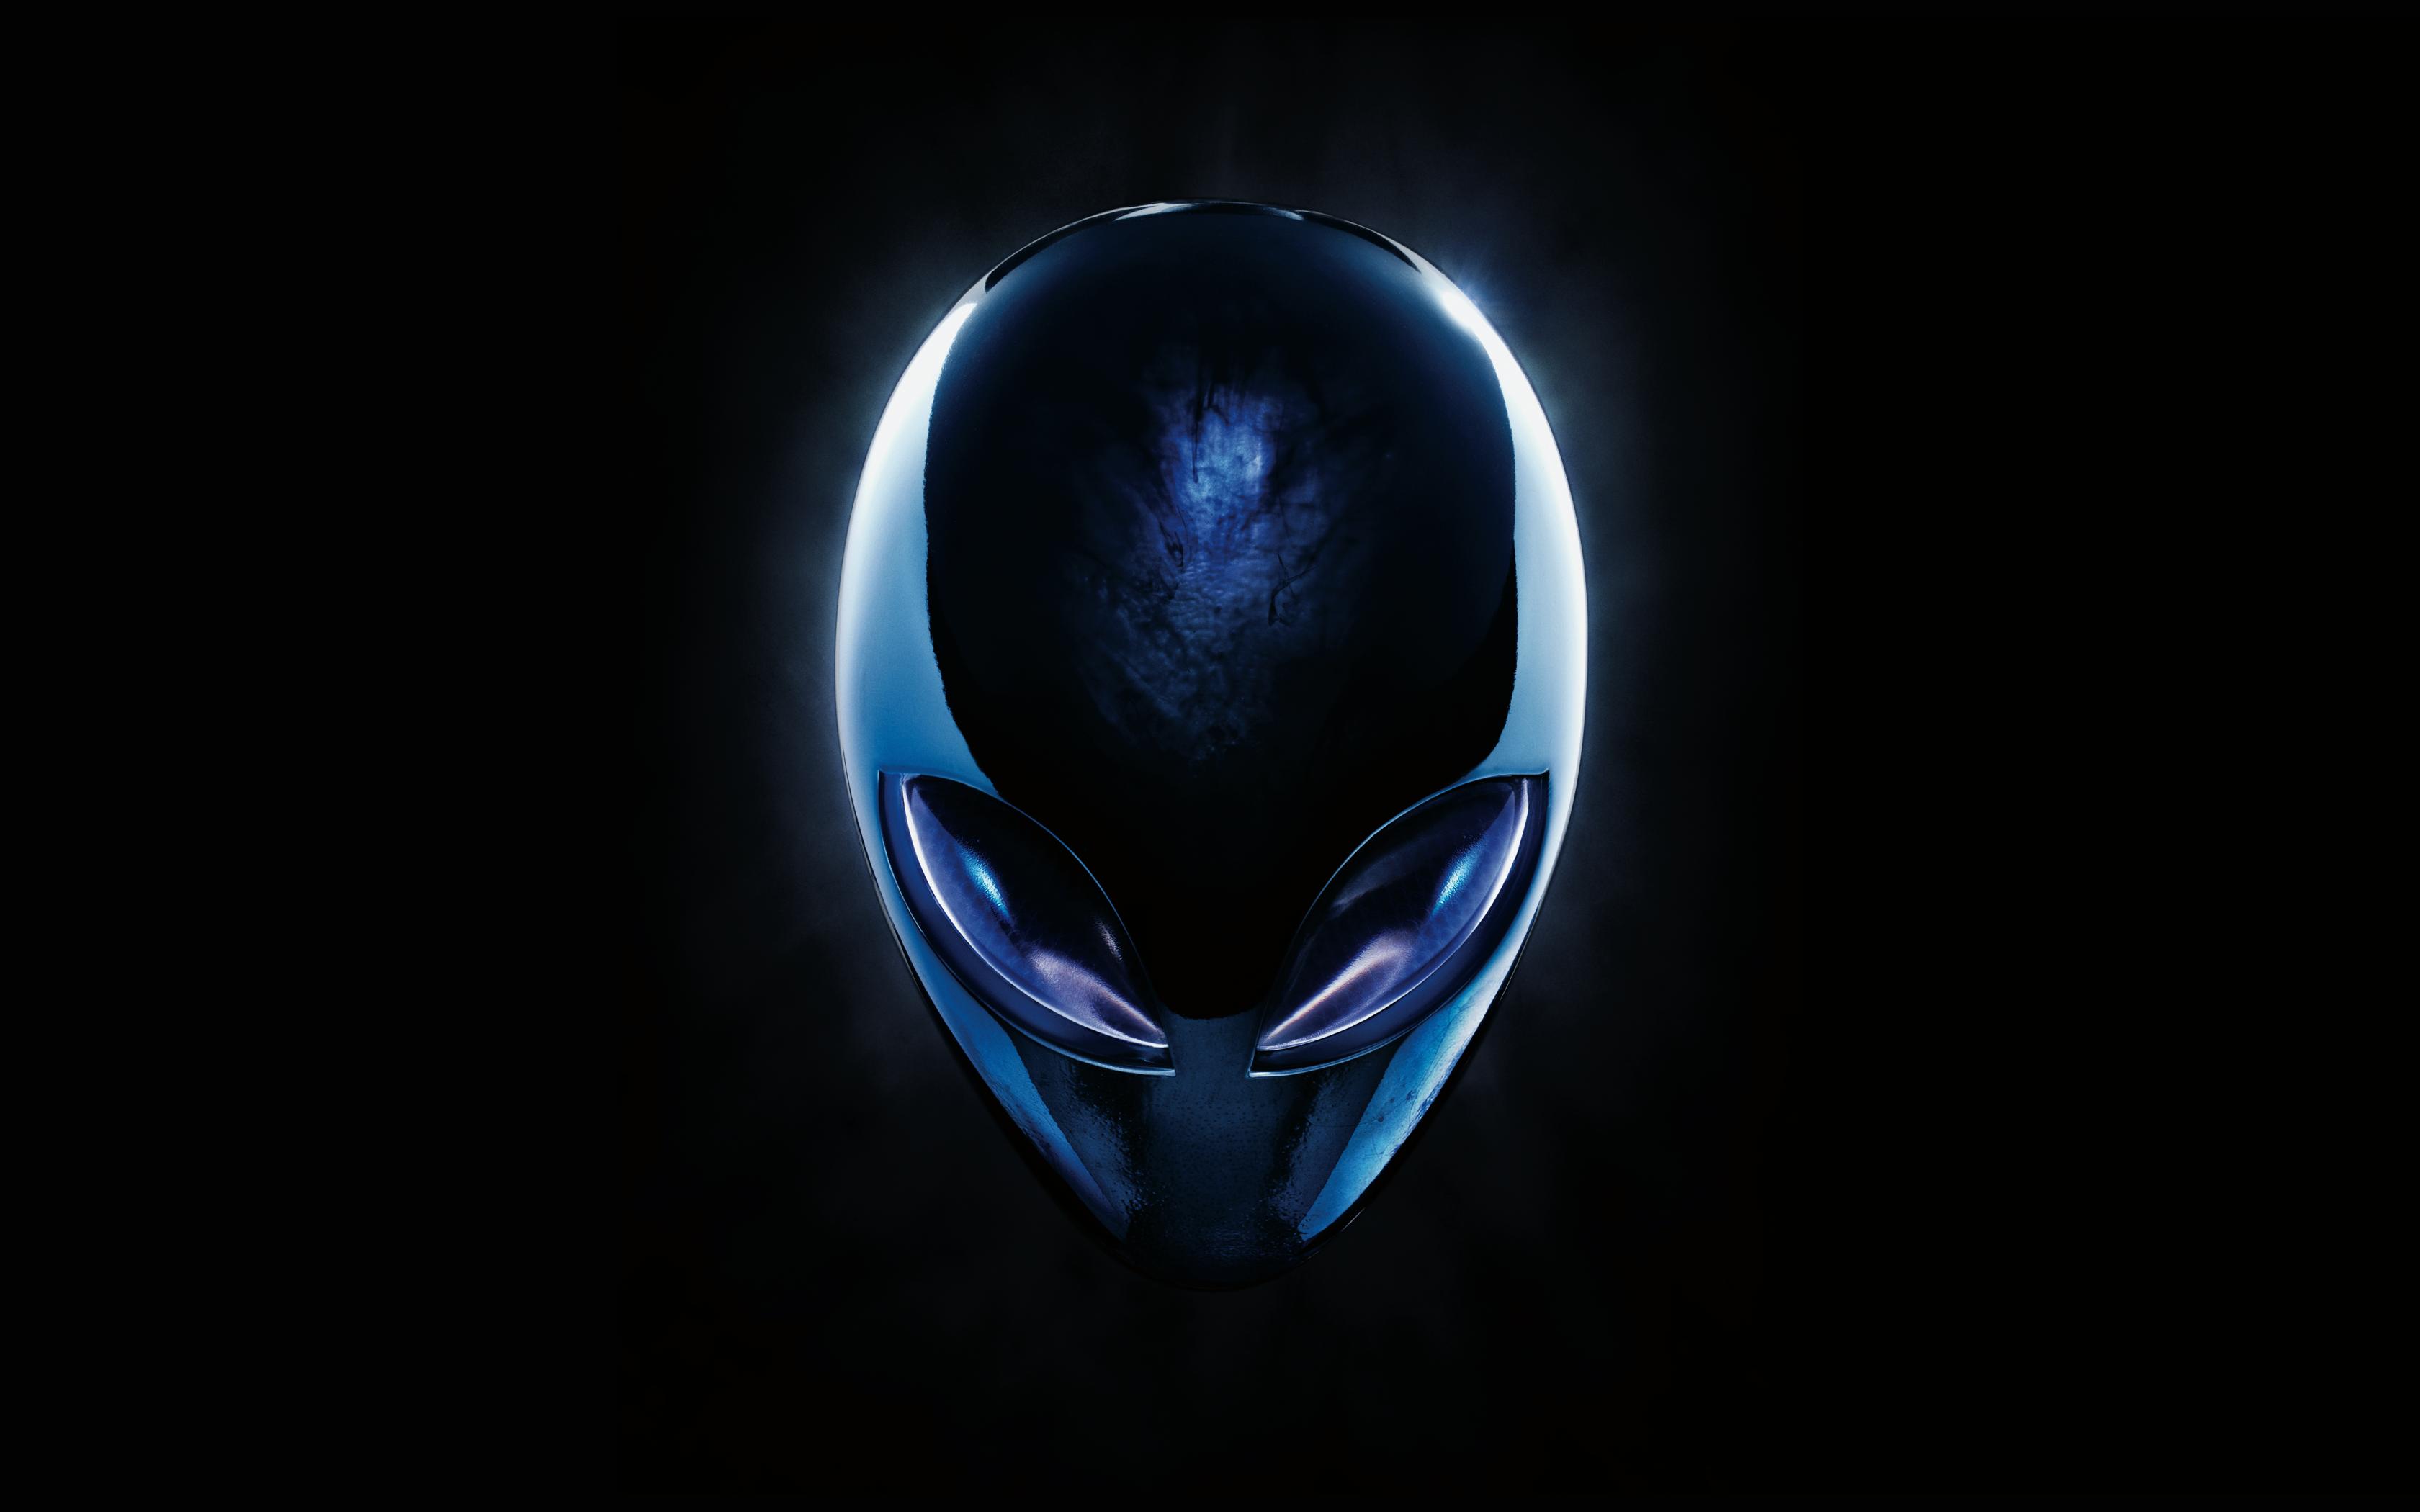 Teknologi - Alienware  - Techno Bakgrund